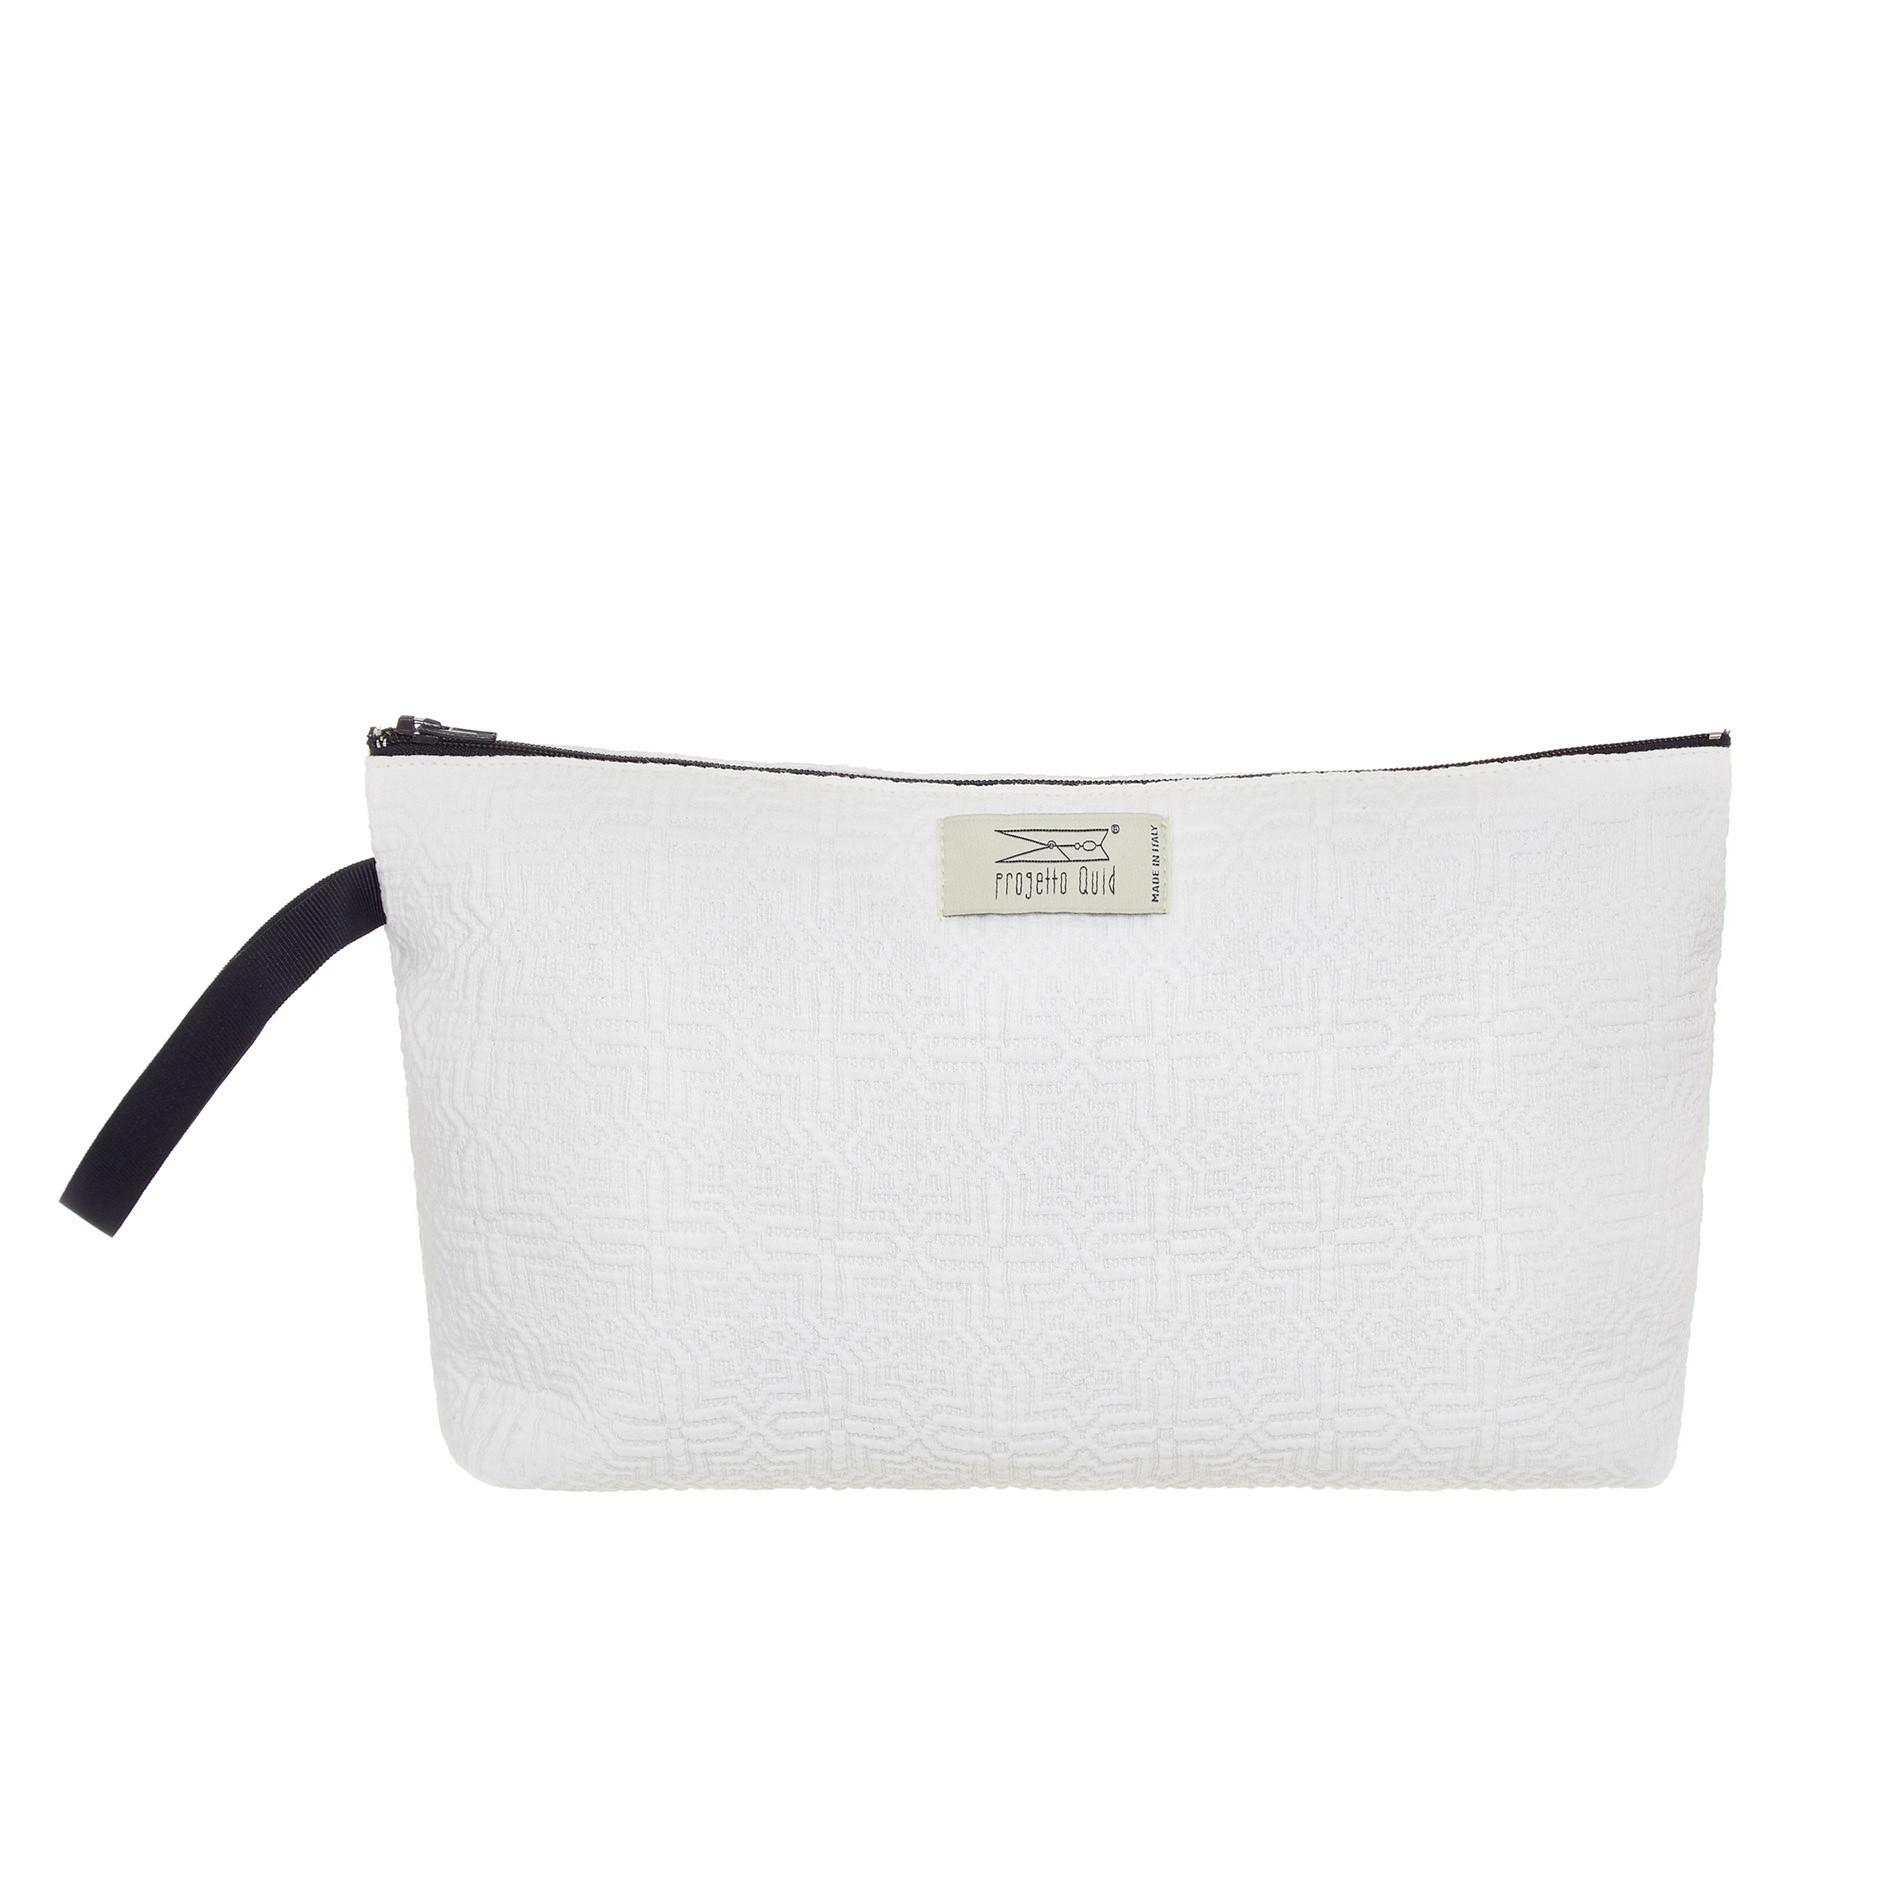 Astuccio in cotone con zip, Bianco, large image number 0